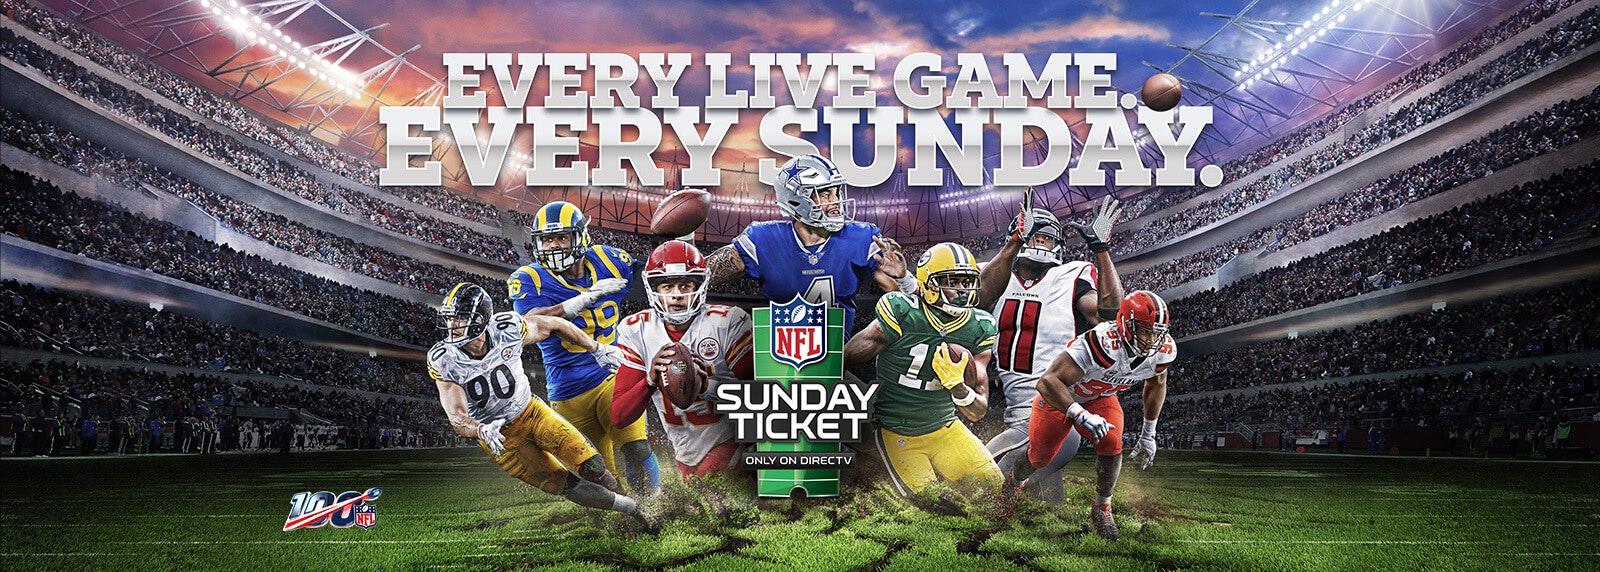 watch giants vs redskins live stream on nfl sunday ticket